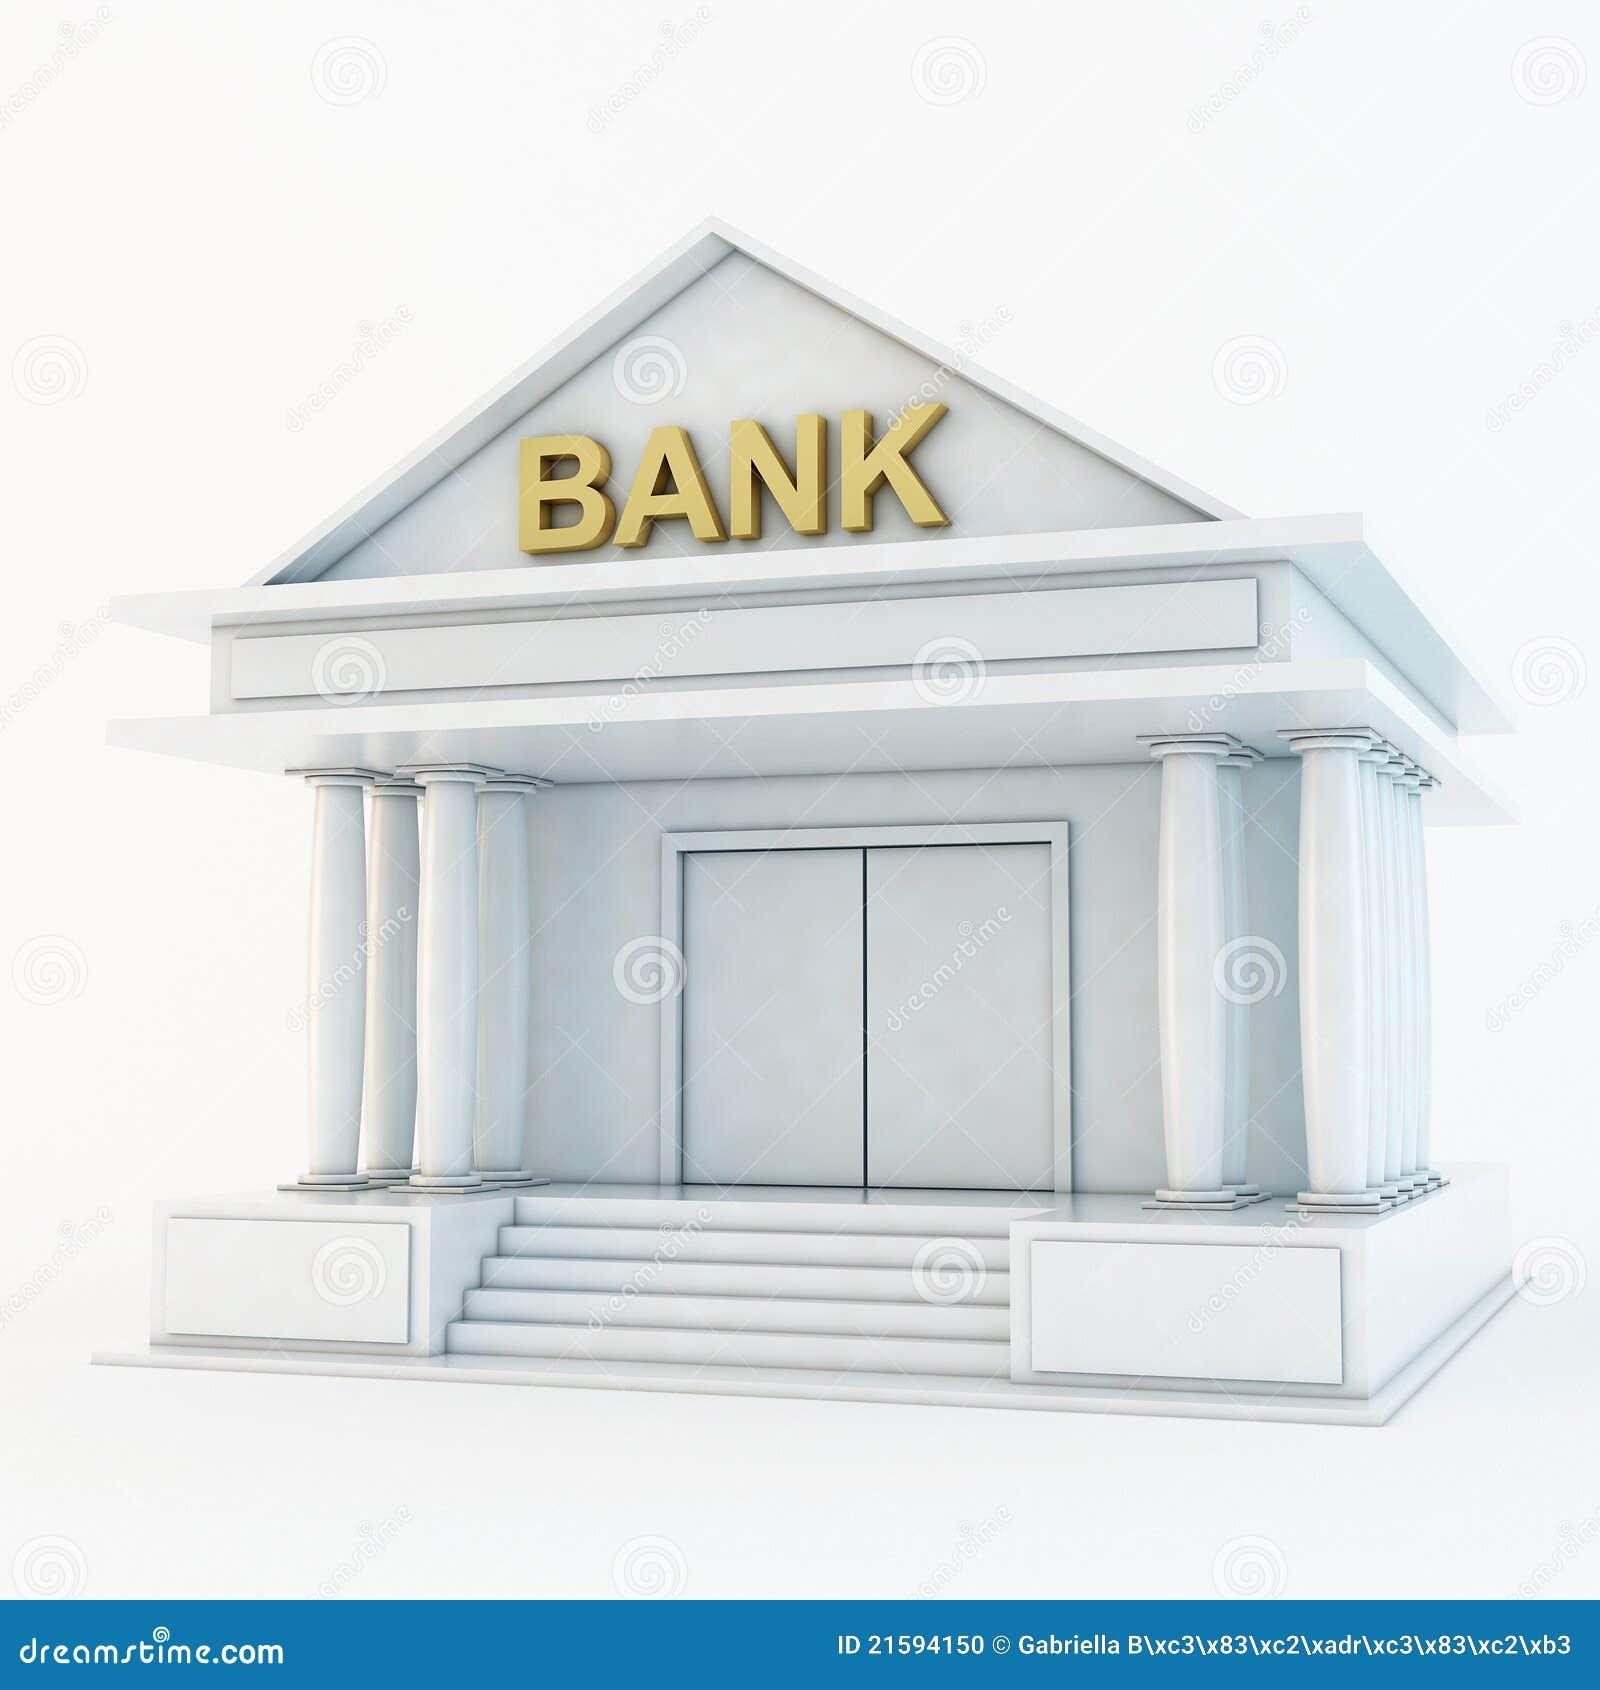 Bank 3d icon stock illustration. Illustration of headquarter - 21594150